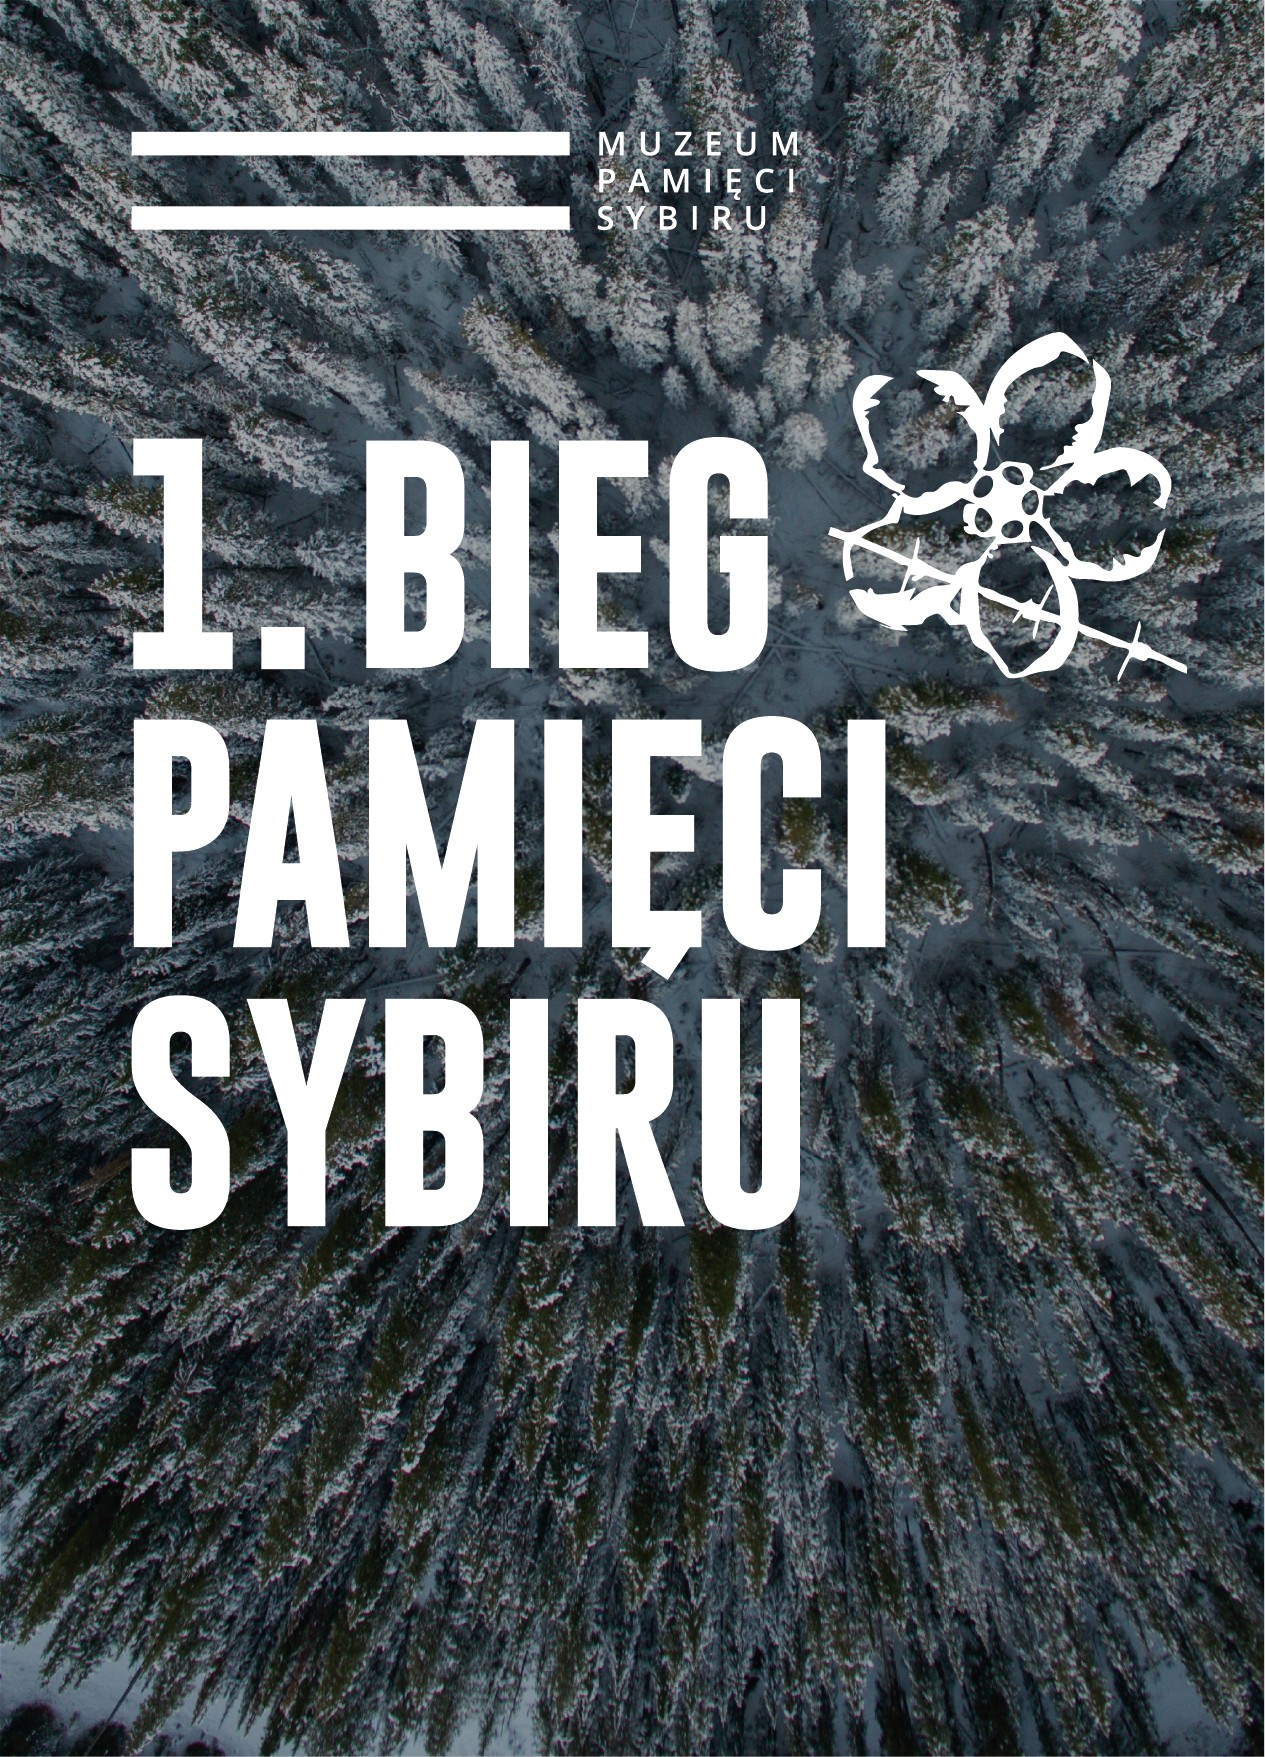 bieg sybiru_logo